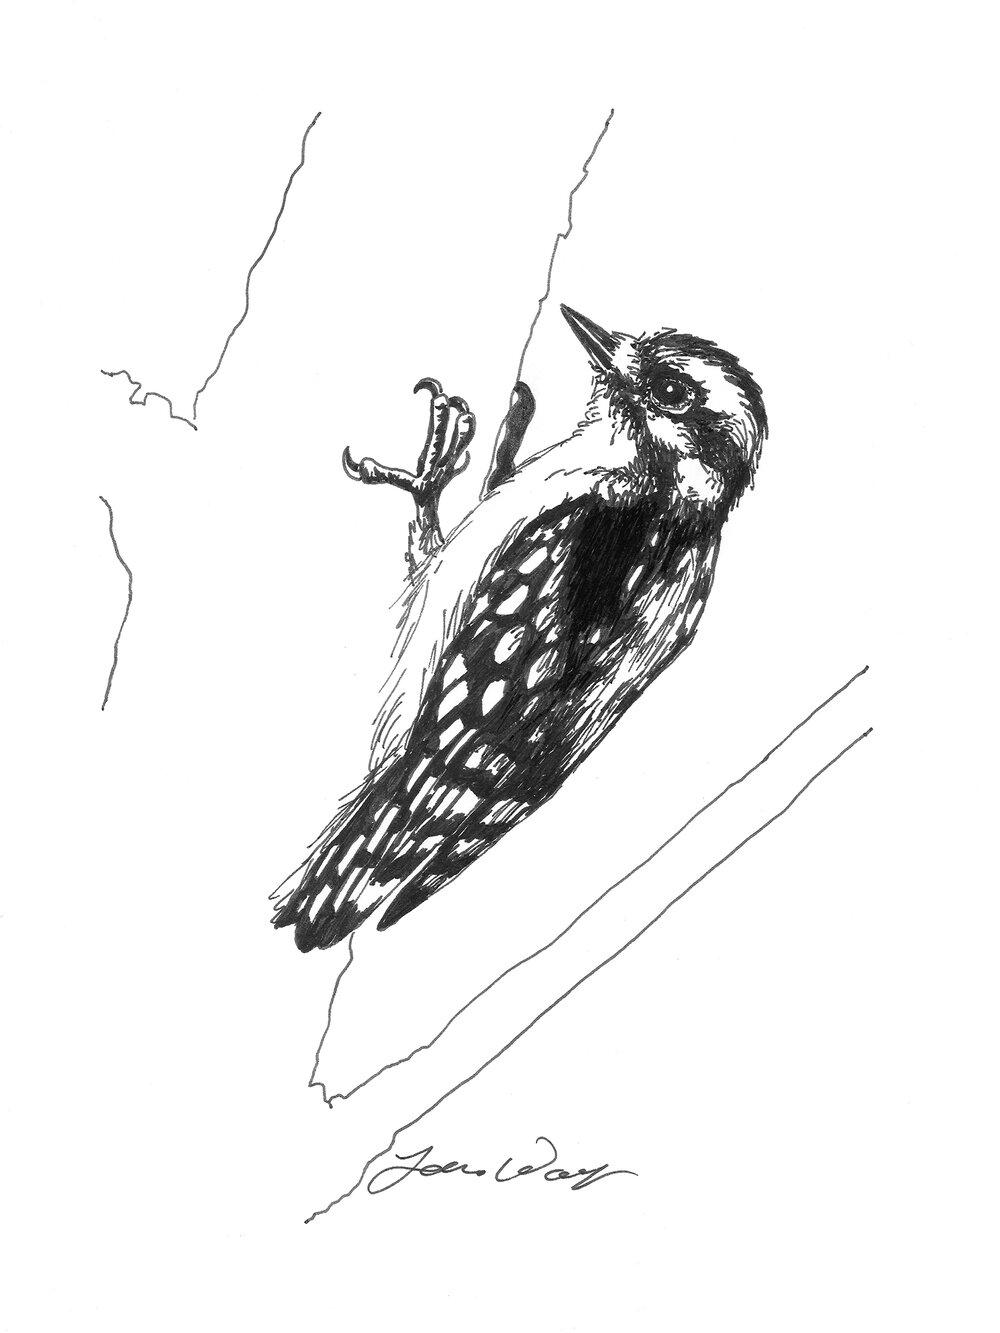 NOT A PRINT Original Colored Pencil Drawing Nerdie Bird Downy Woodpecker